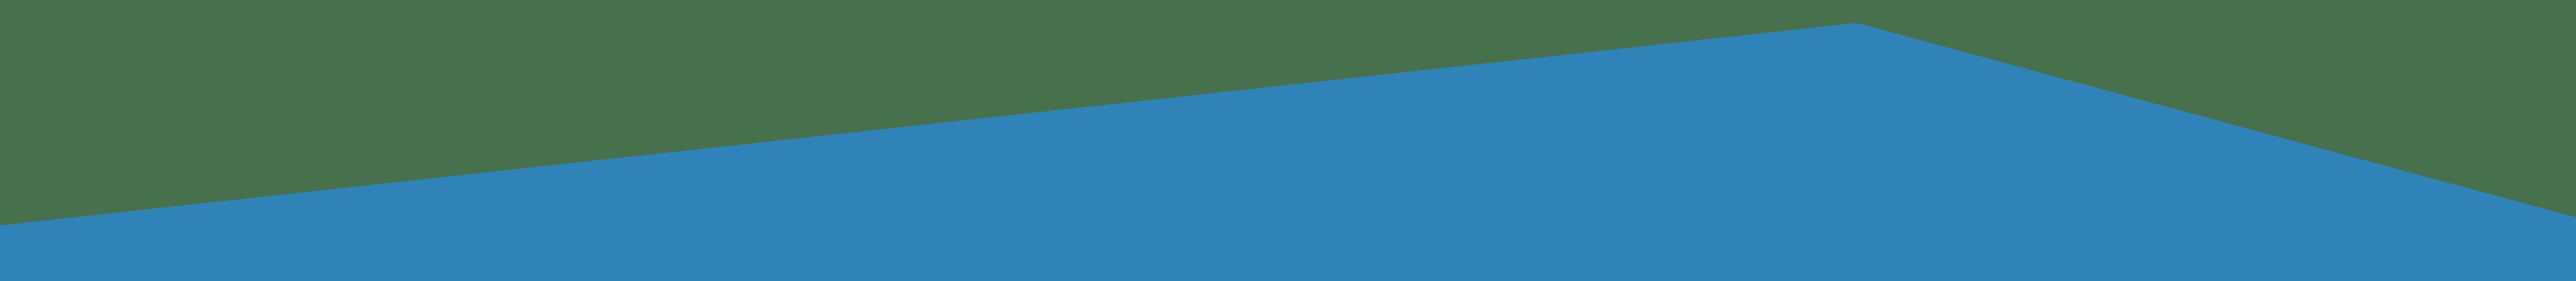 curve-blue